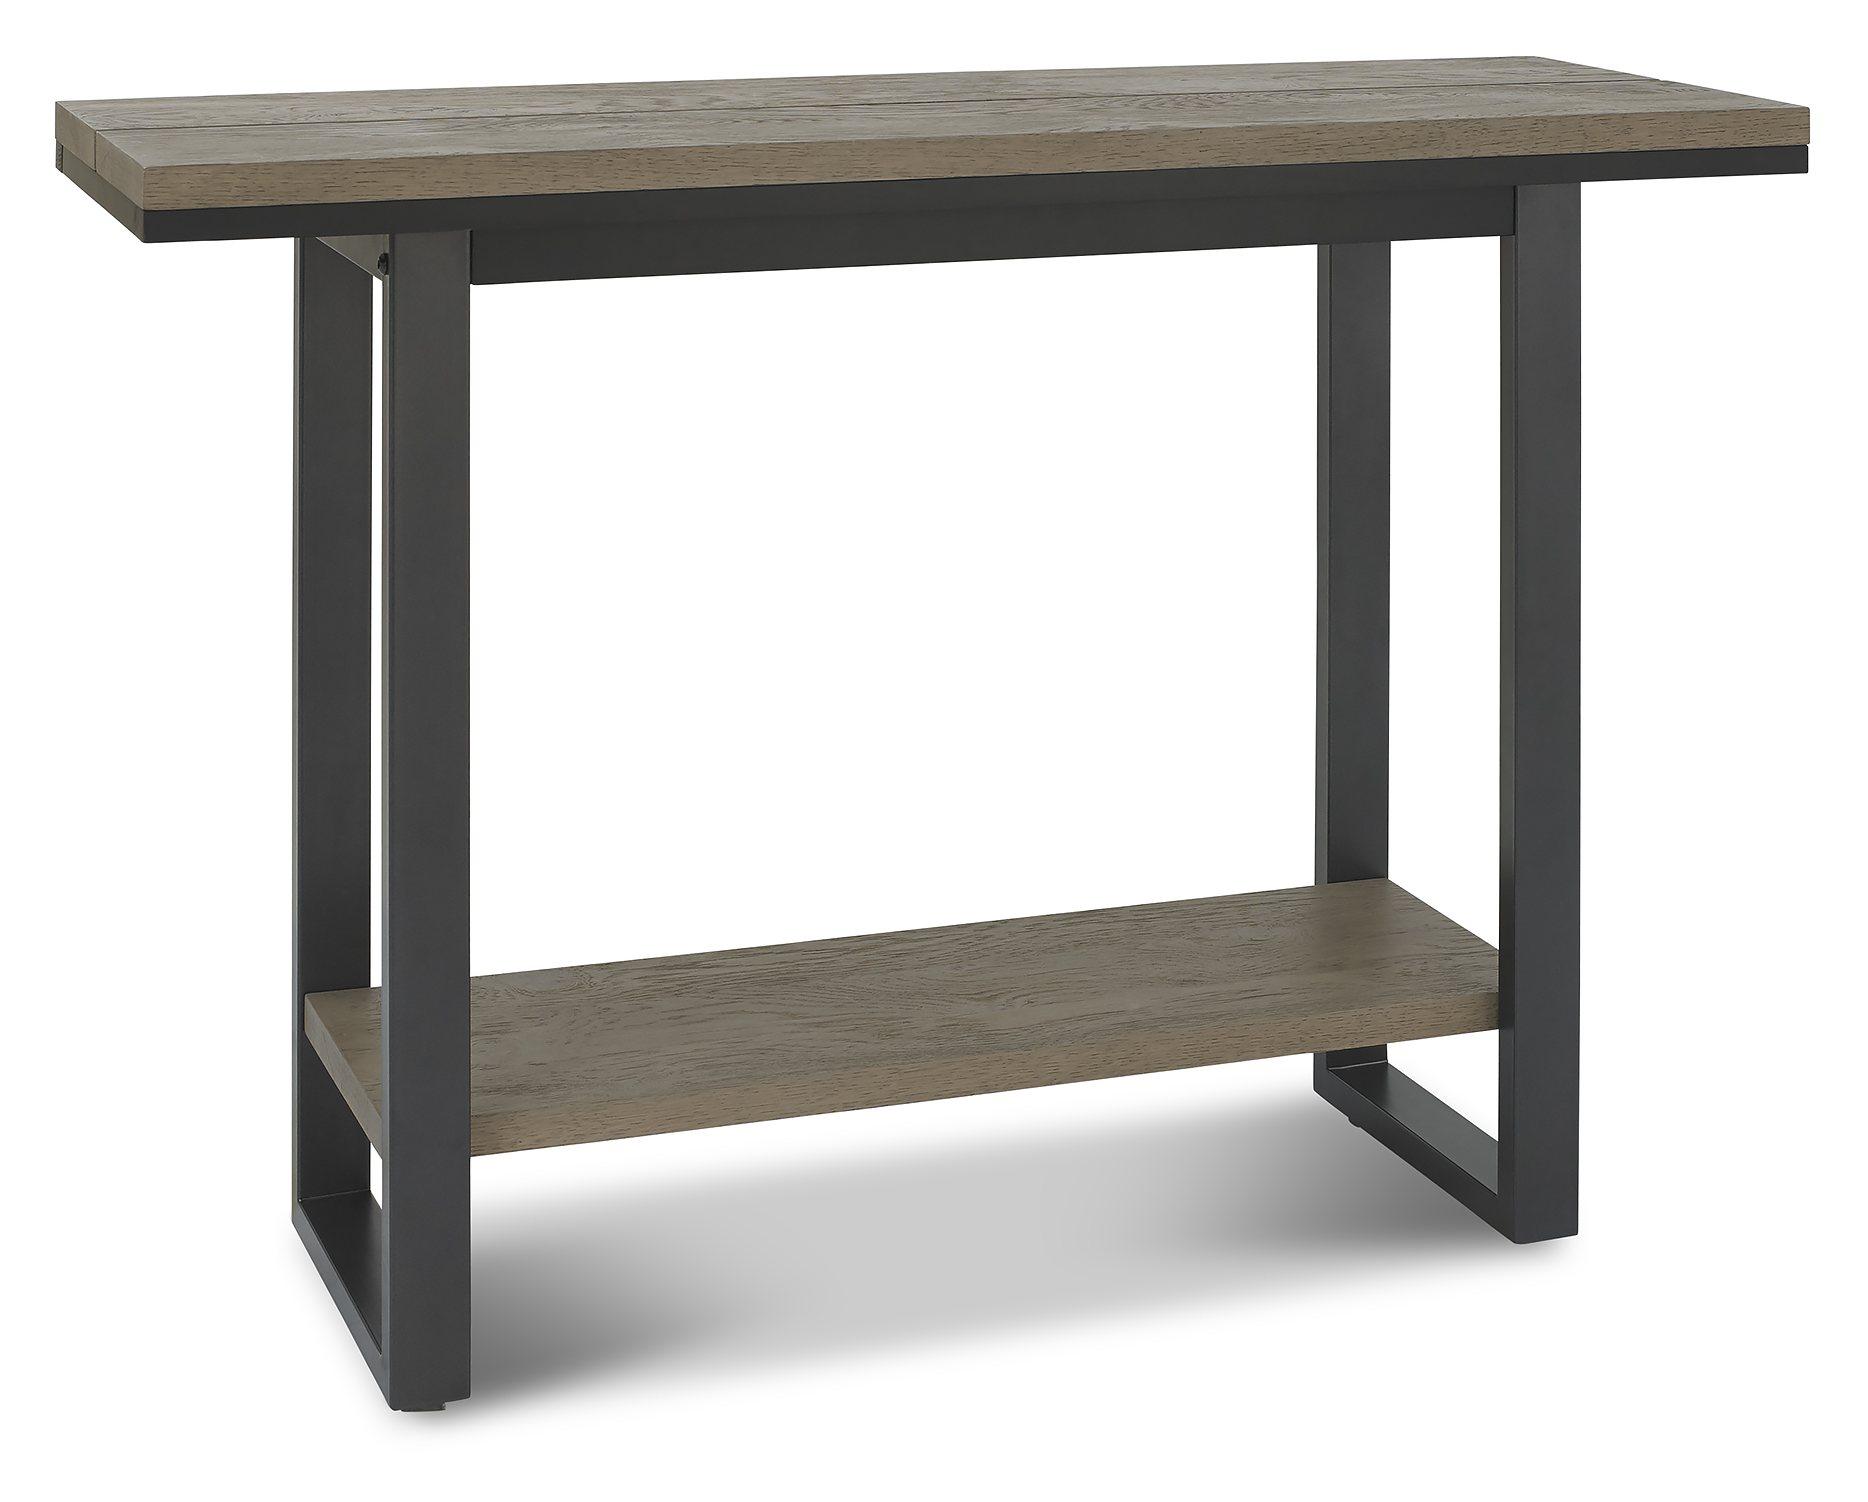 BRIMDISI - CONSOLE TABLE ANGLE VIEW